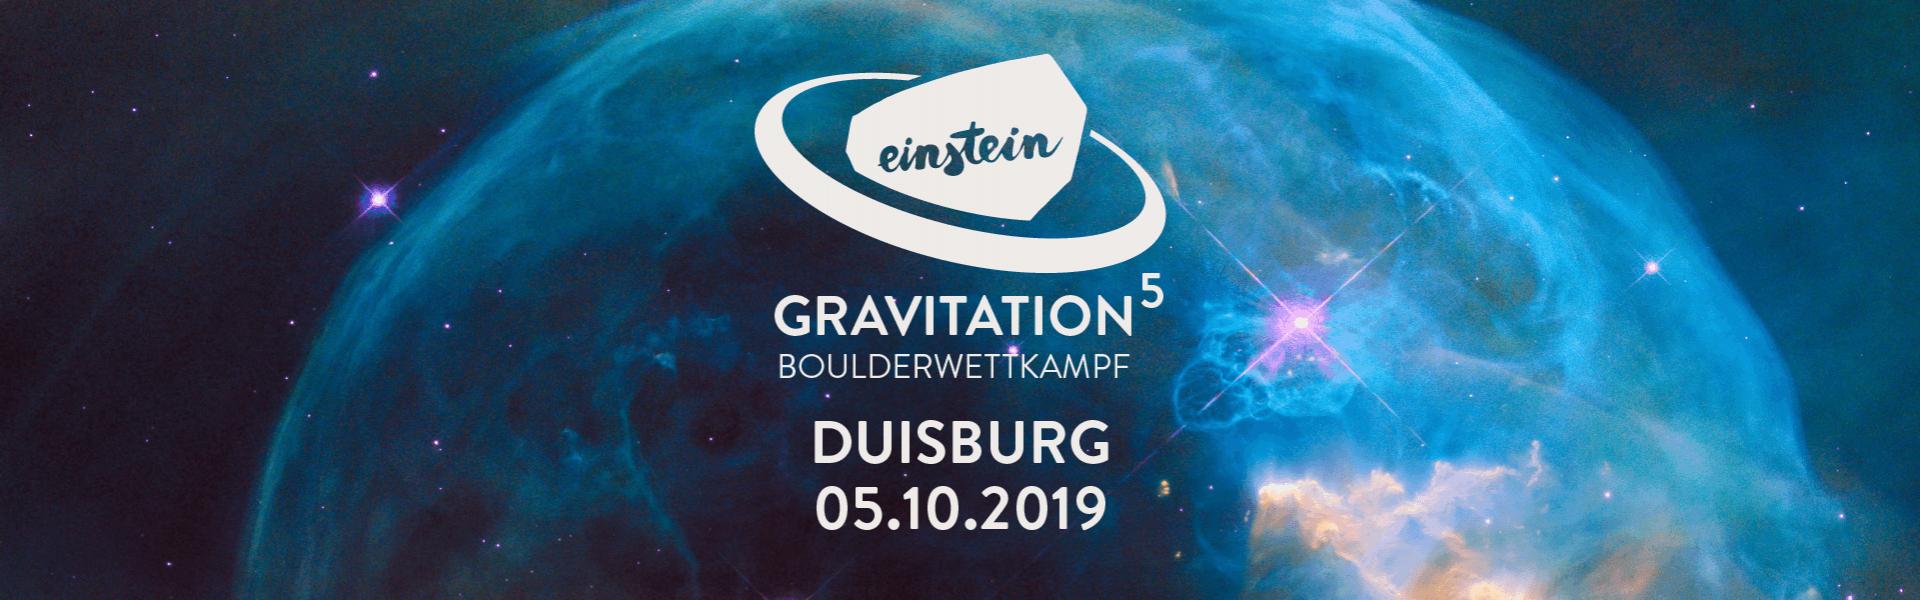 eB_Gravitation_eBD_web